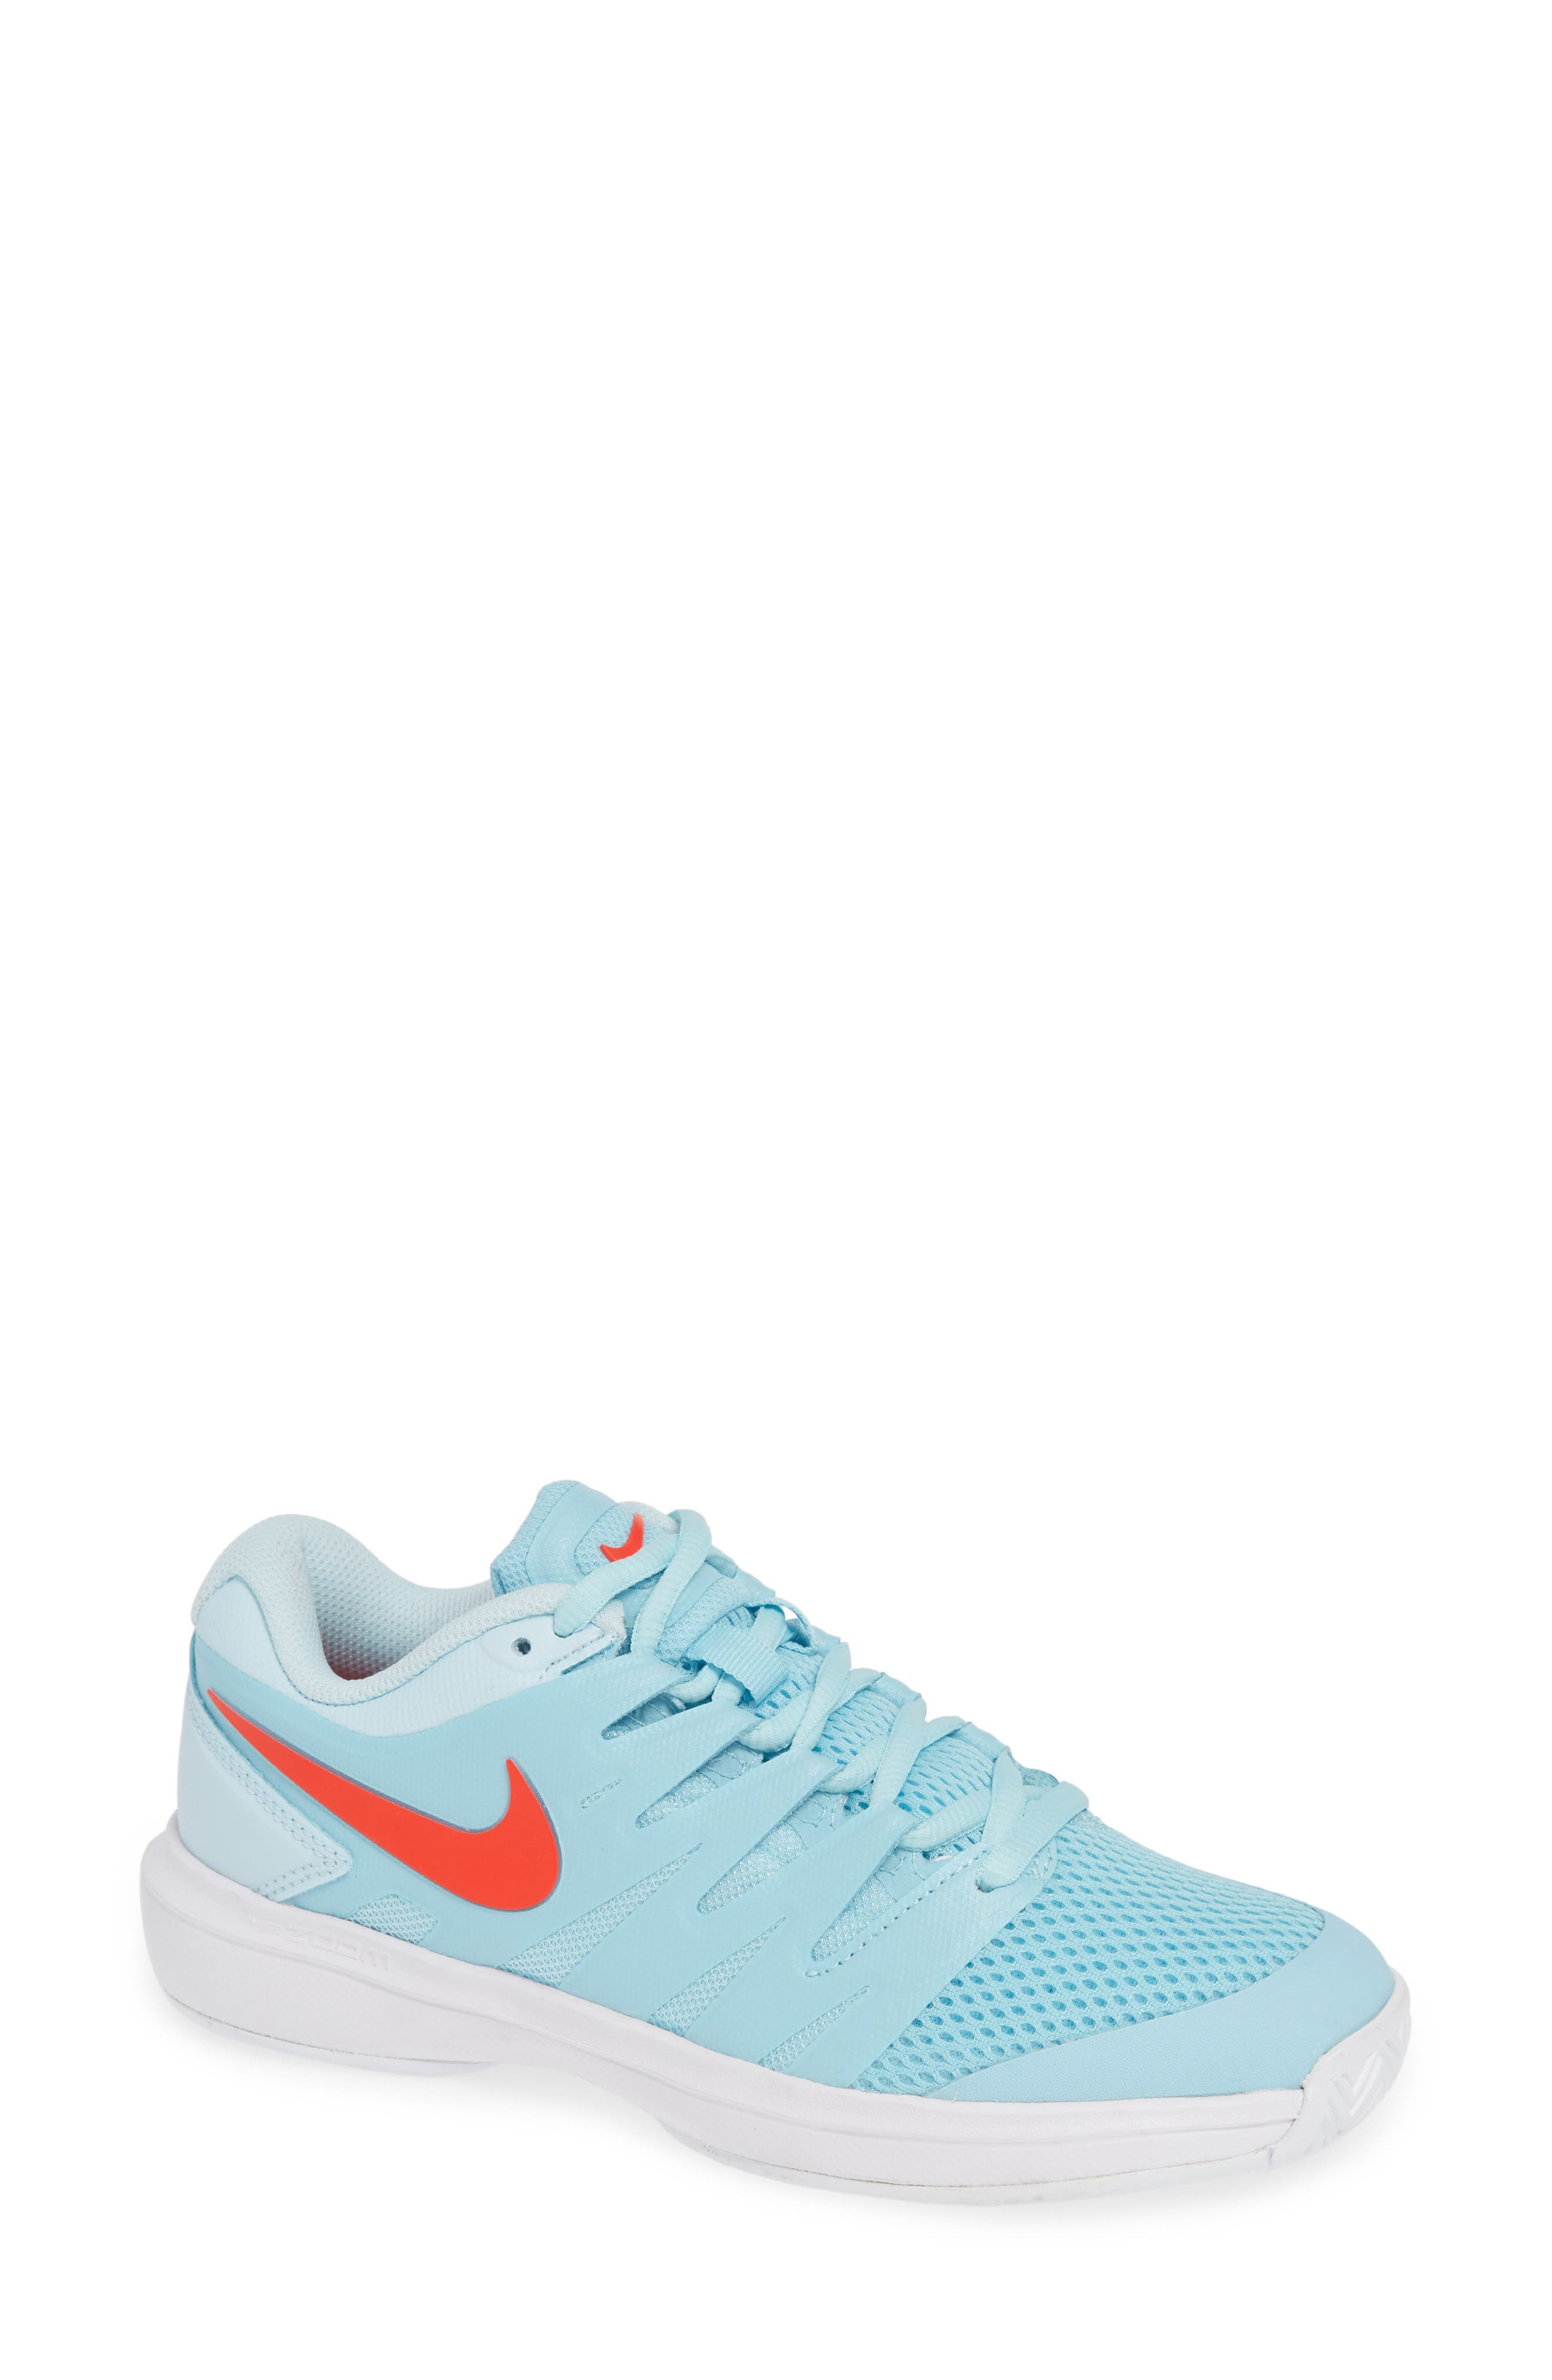 Air Zoom Prestige Tennis Shoe,                             Main thumbnail 1, color,                             BLUE/ BRIGHT CRIMSON-TOPAZ